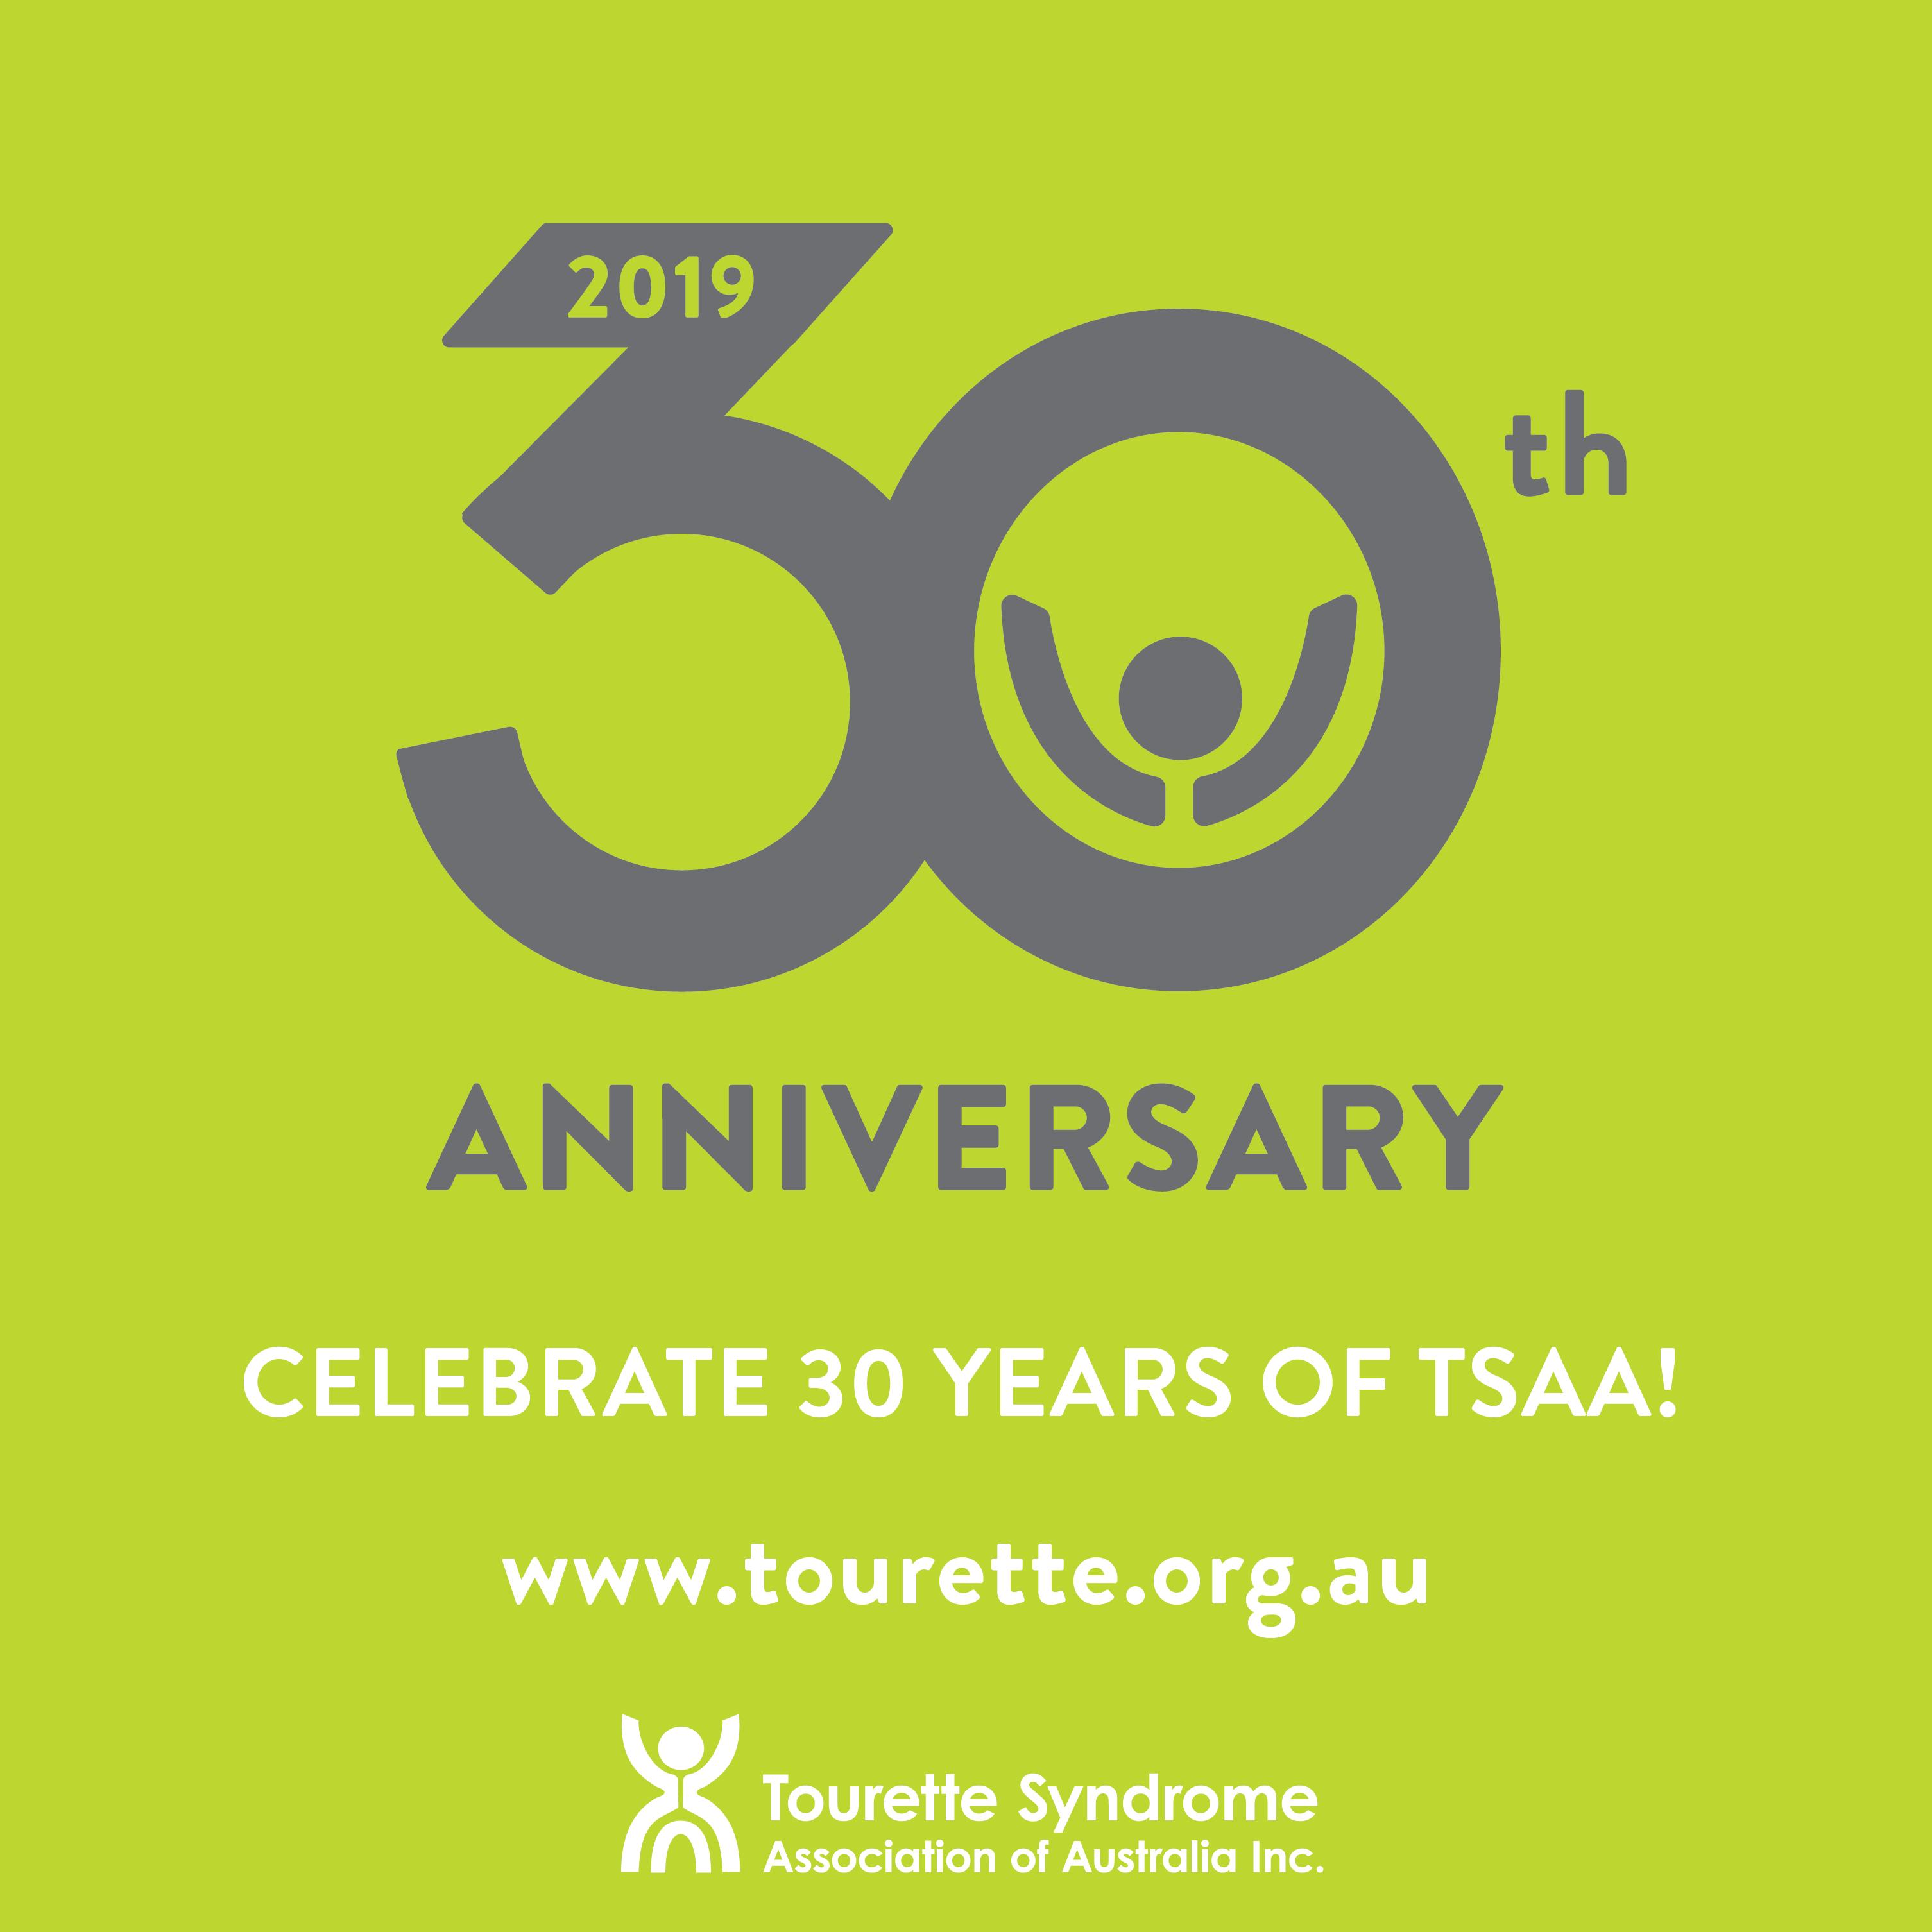 Awareness Campaigns – Tourette Syndrome Association of Australia